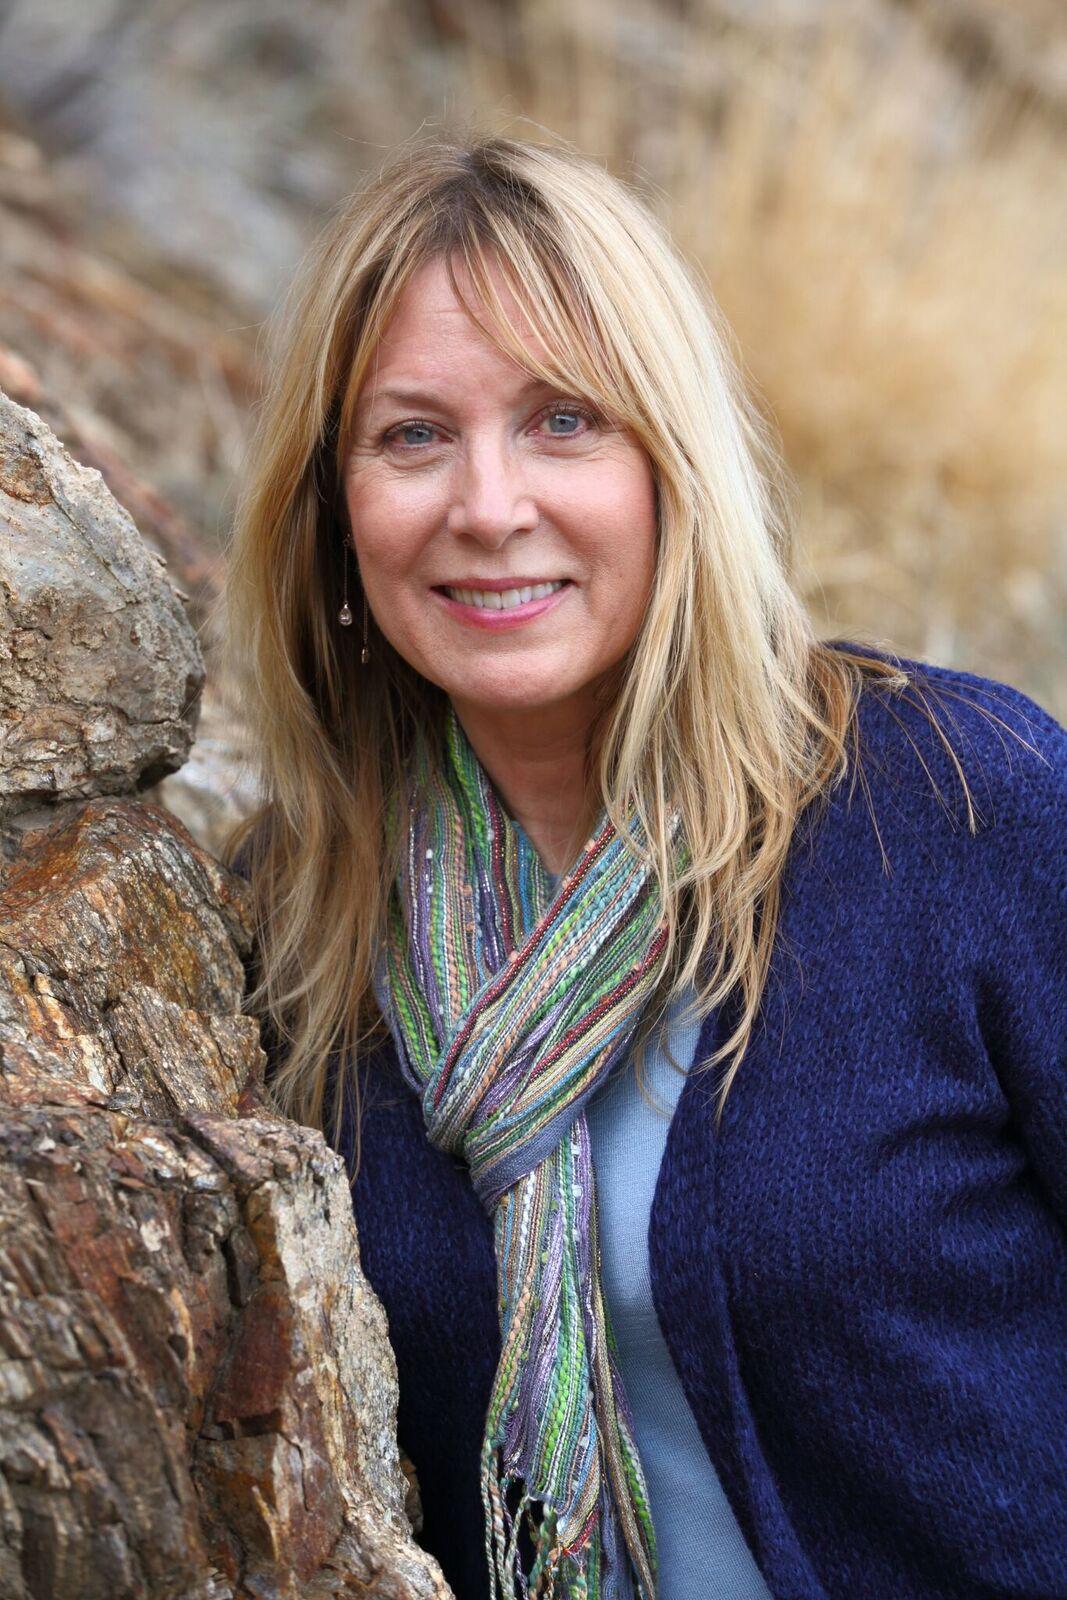 Deborah_Meints_Pierson_Therapist_Coachella